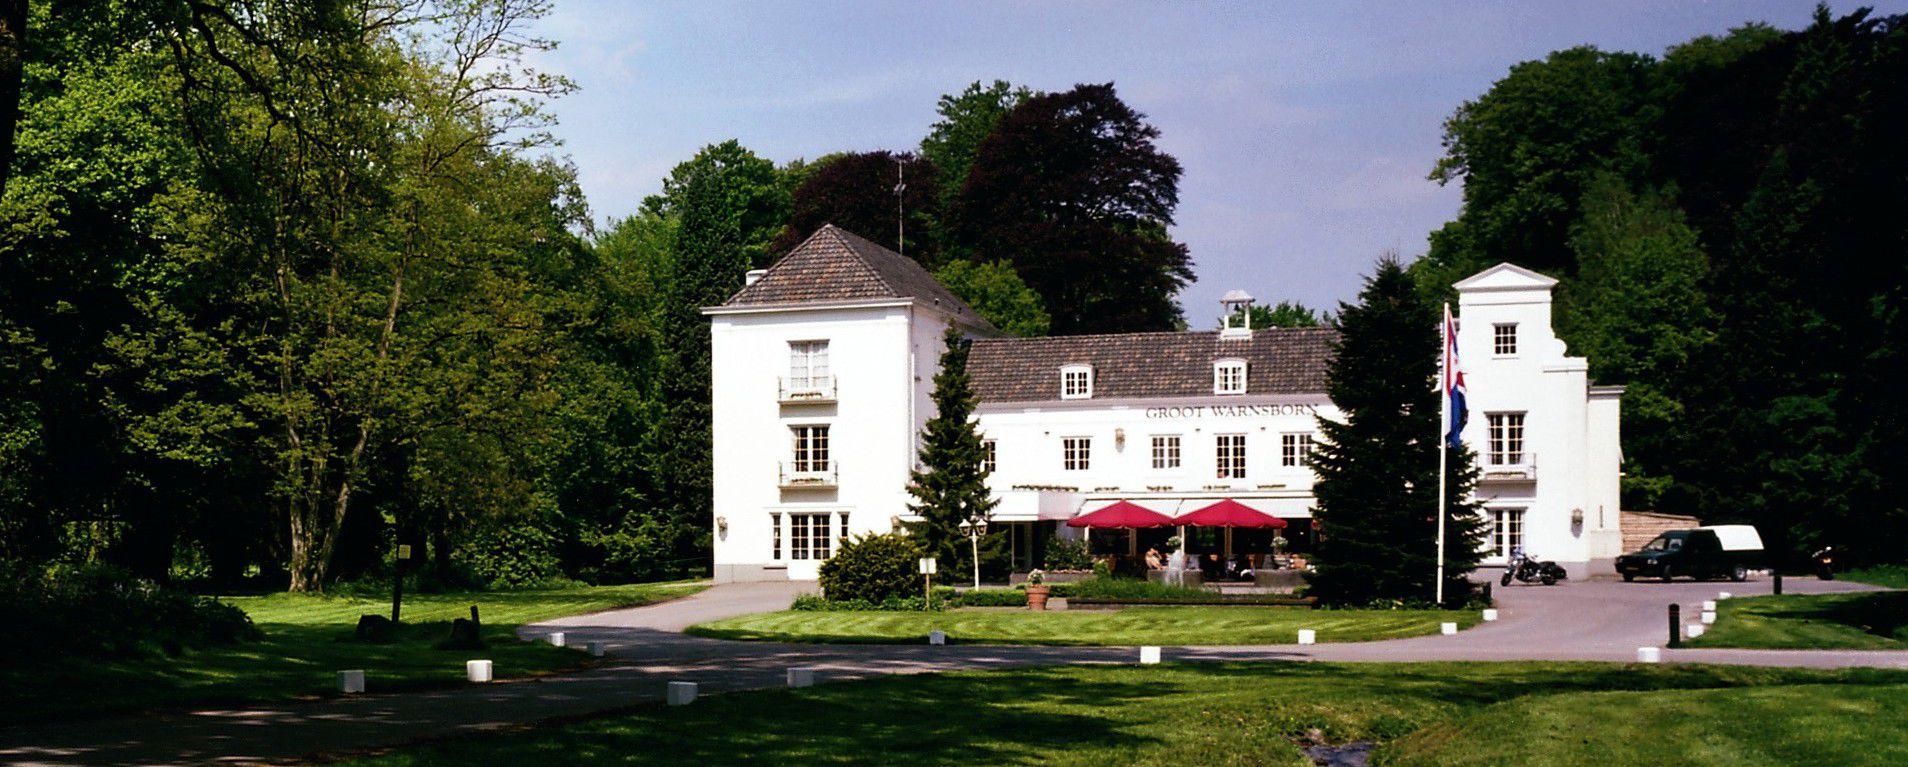 Luxe Hotel Arnhem | landgoed hotel